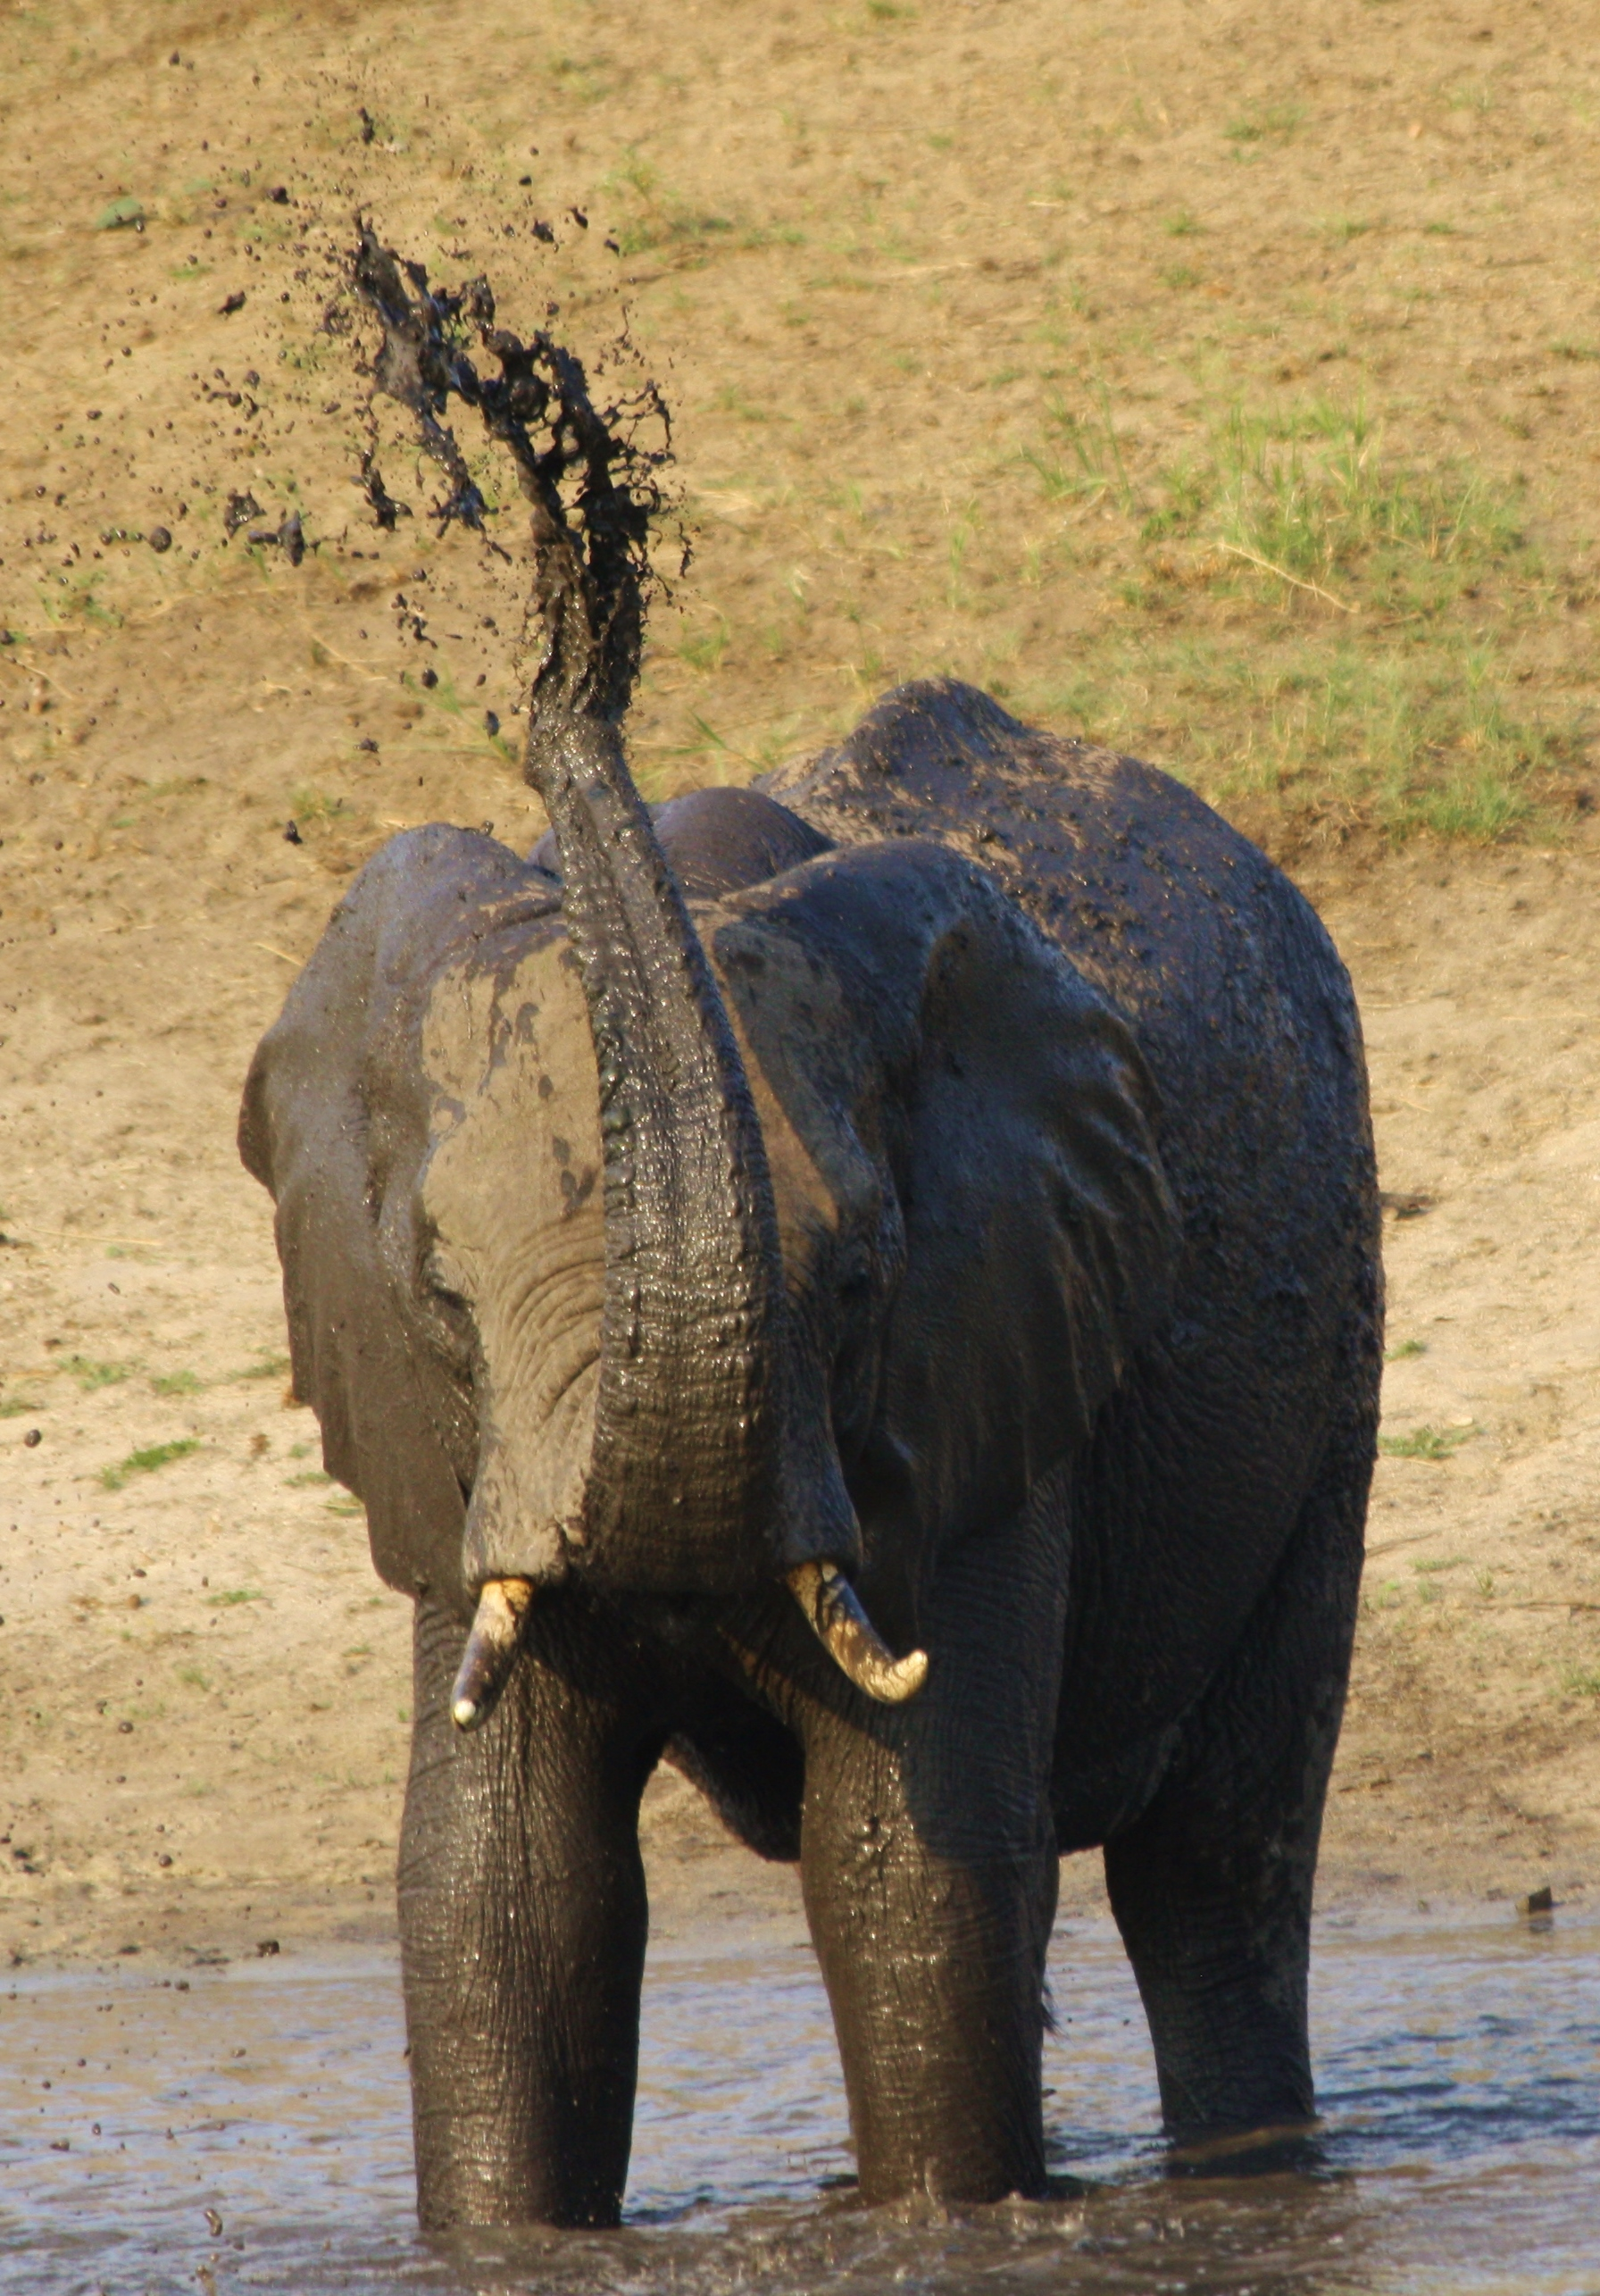 Watching this elephant splashing himself was a highlight of our walking safari